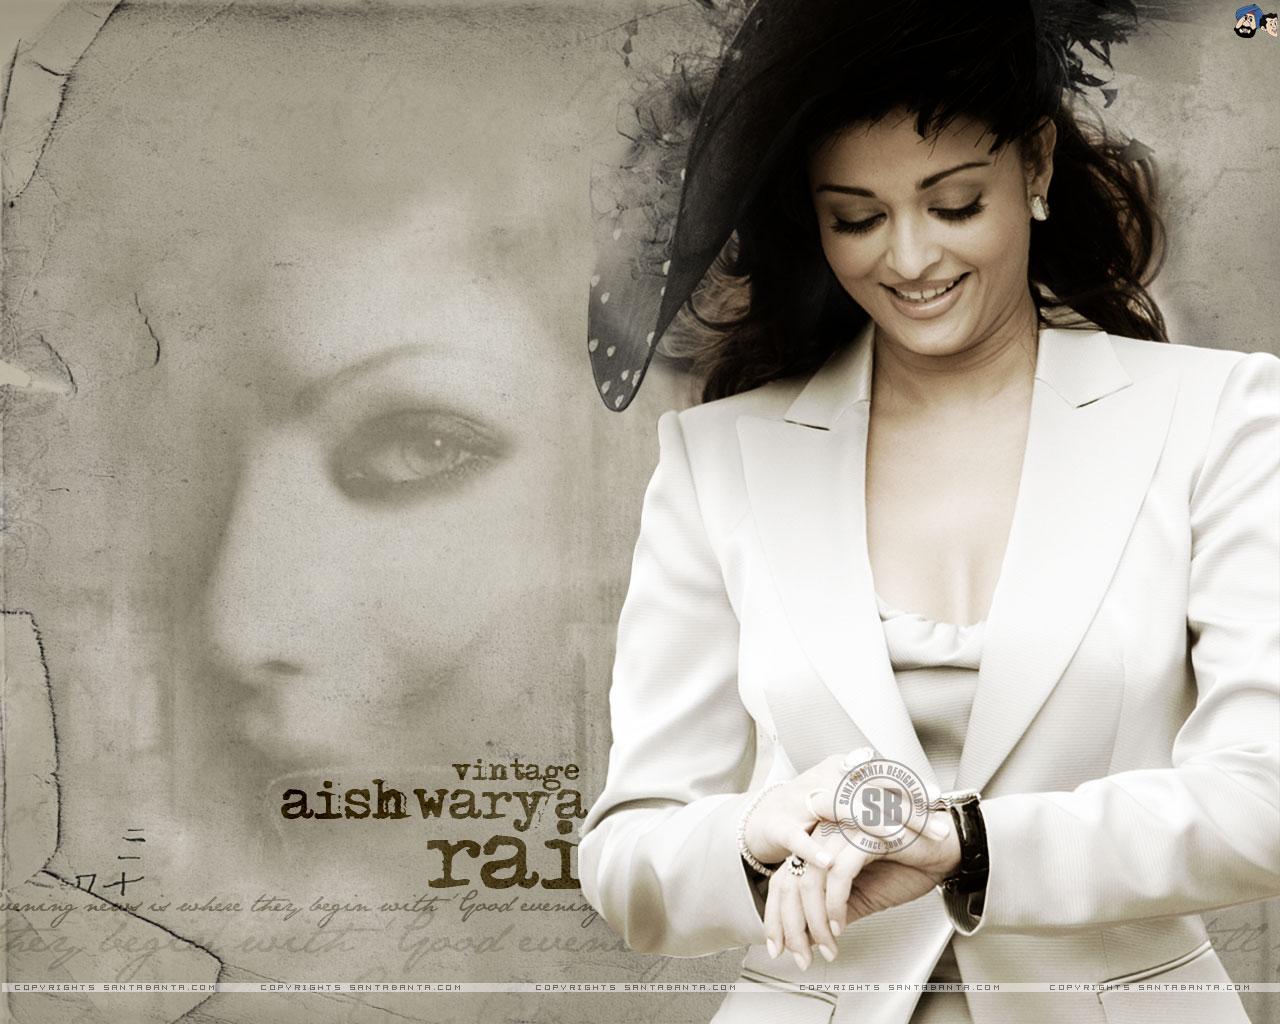 http://2.bp.blogspot.com/-PybNYmANl_8/T-TVL8wWp5I/AAAAAAAAE8g/P52frEwjrLM/s1600/Aishwarya+Rai+in+white+suit.jpg